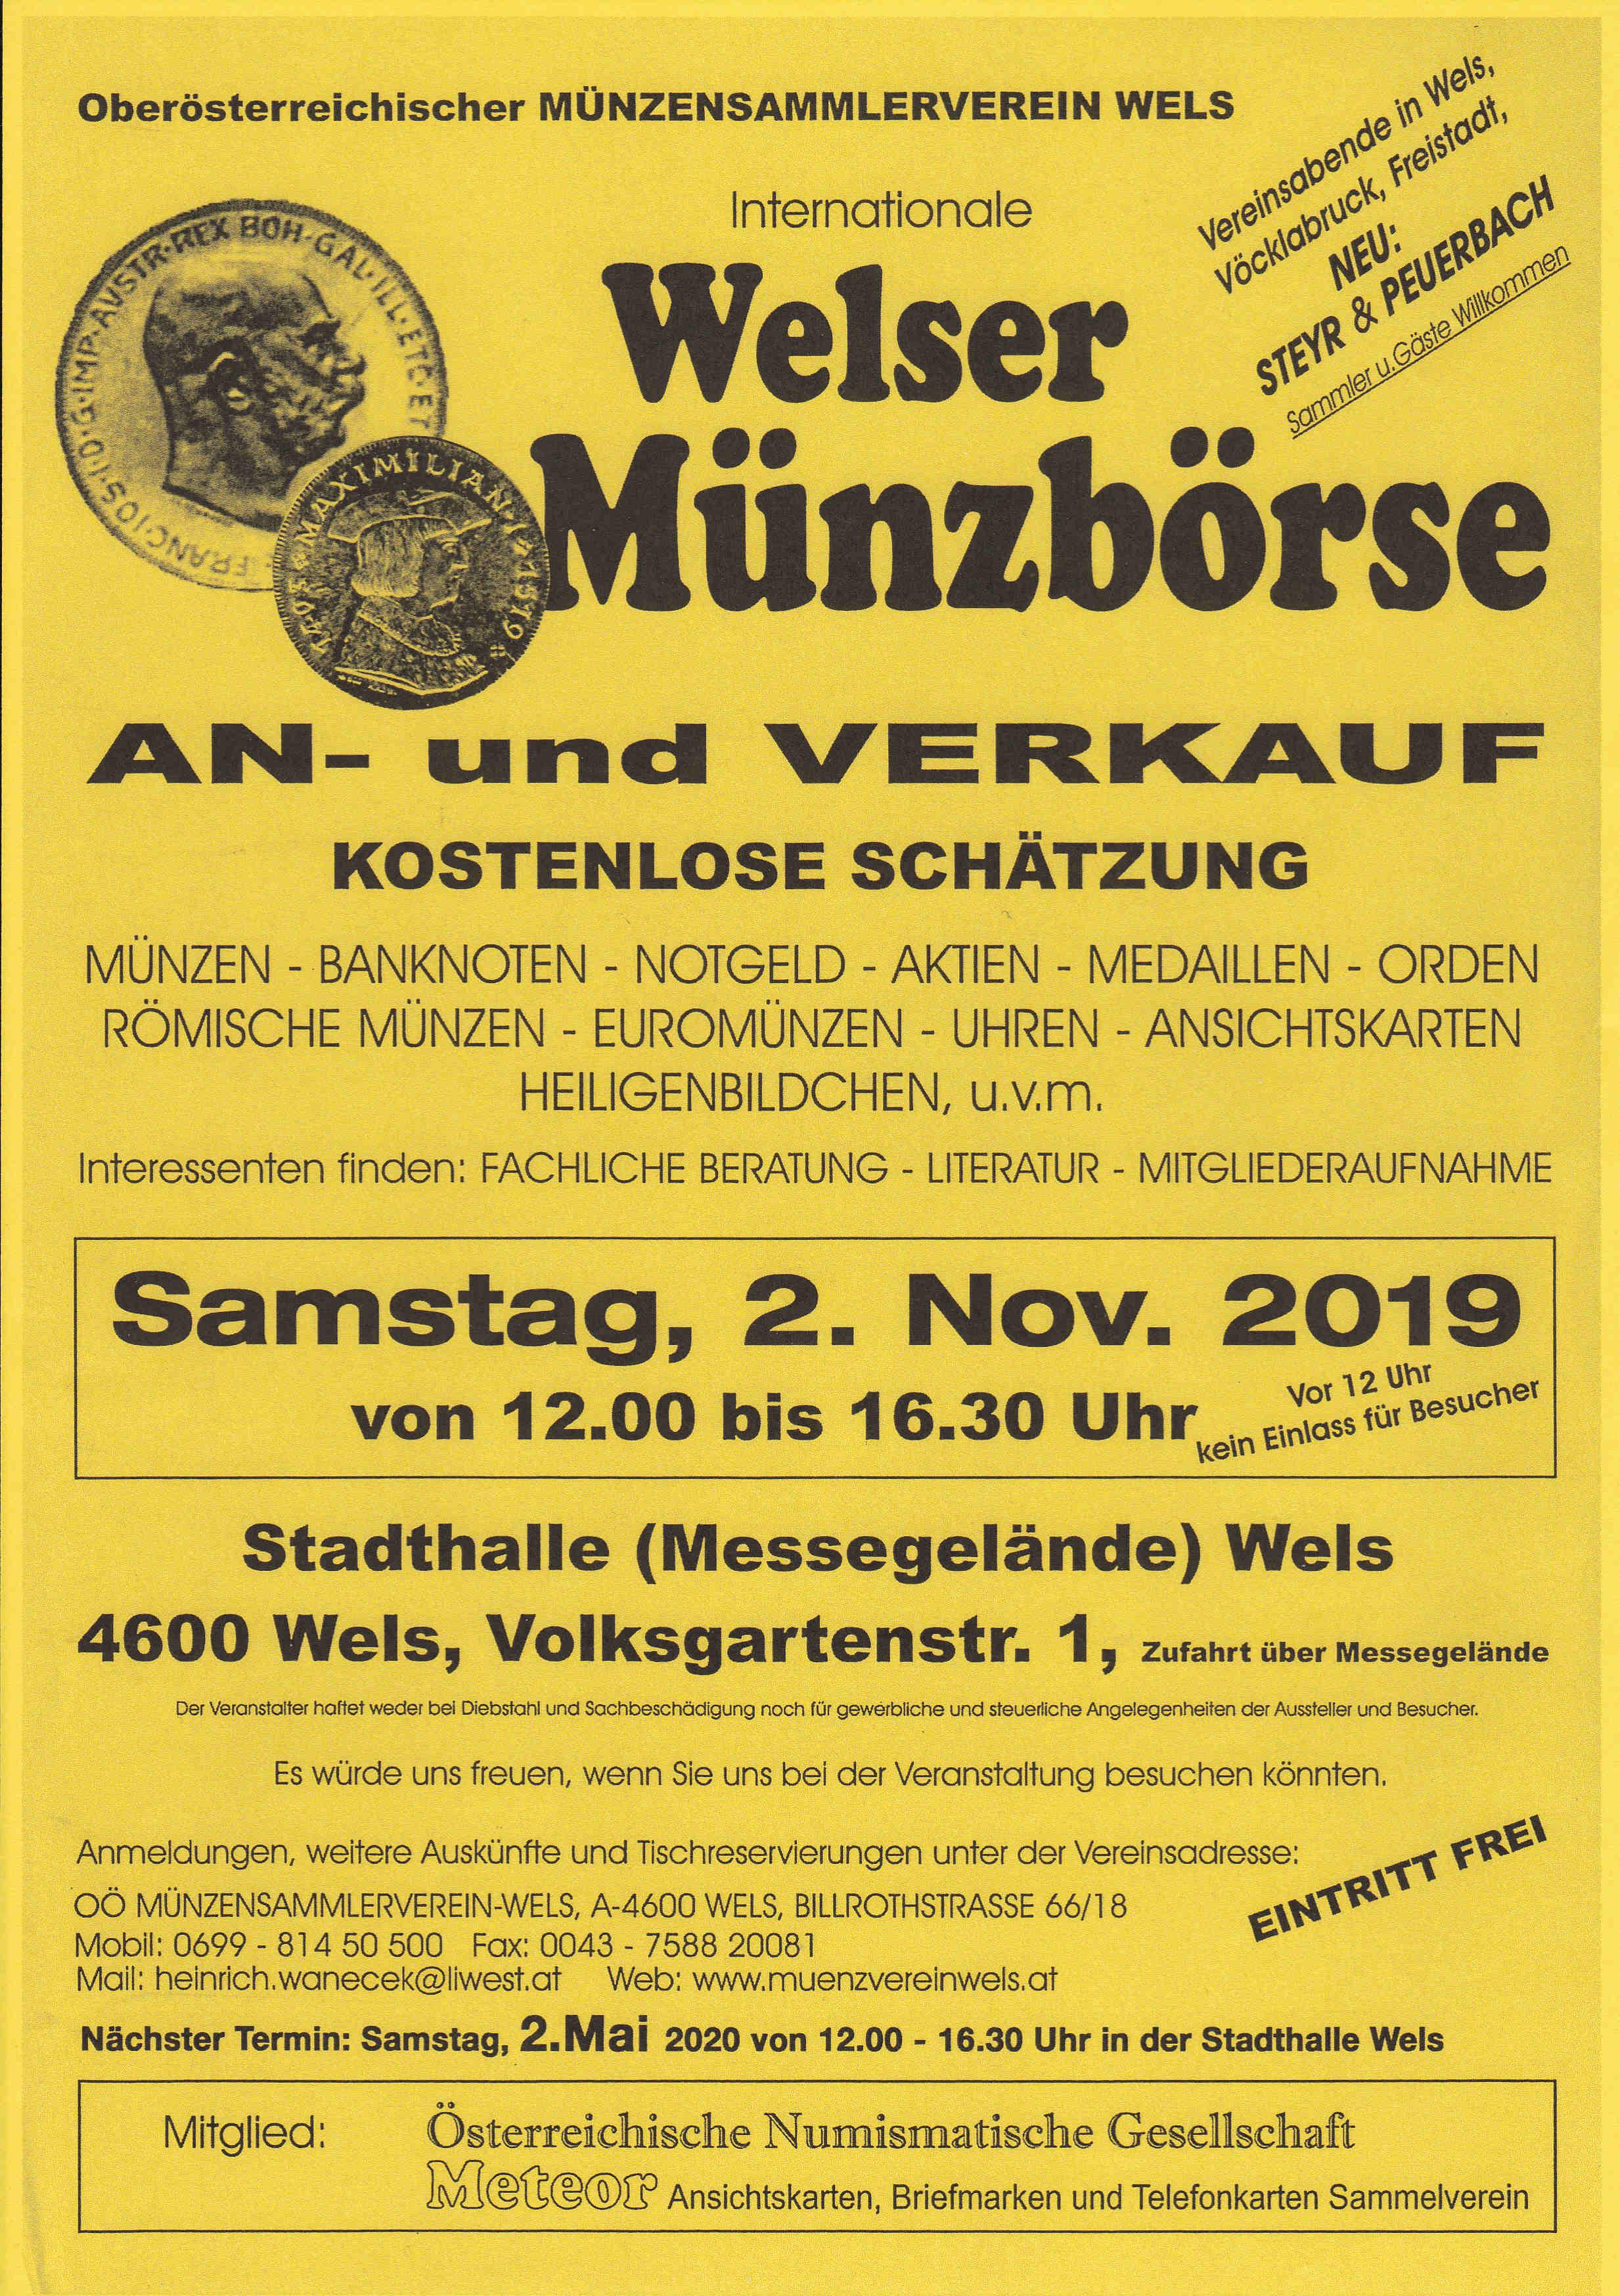 Welser Münzbörse 02.11.2019 Samstag 12:00 bis 16:30 Img232